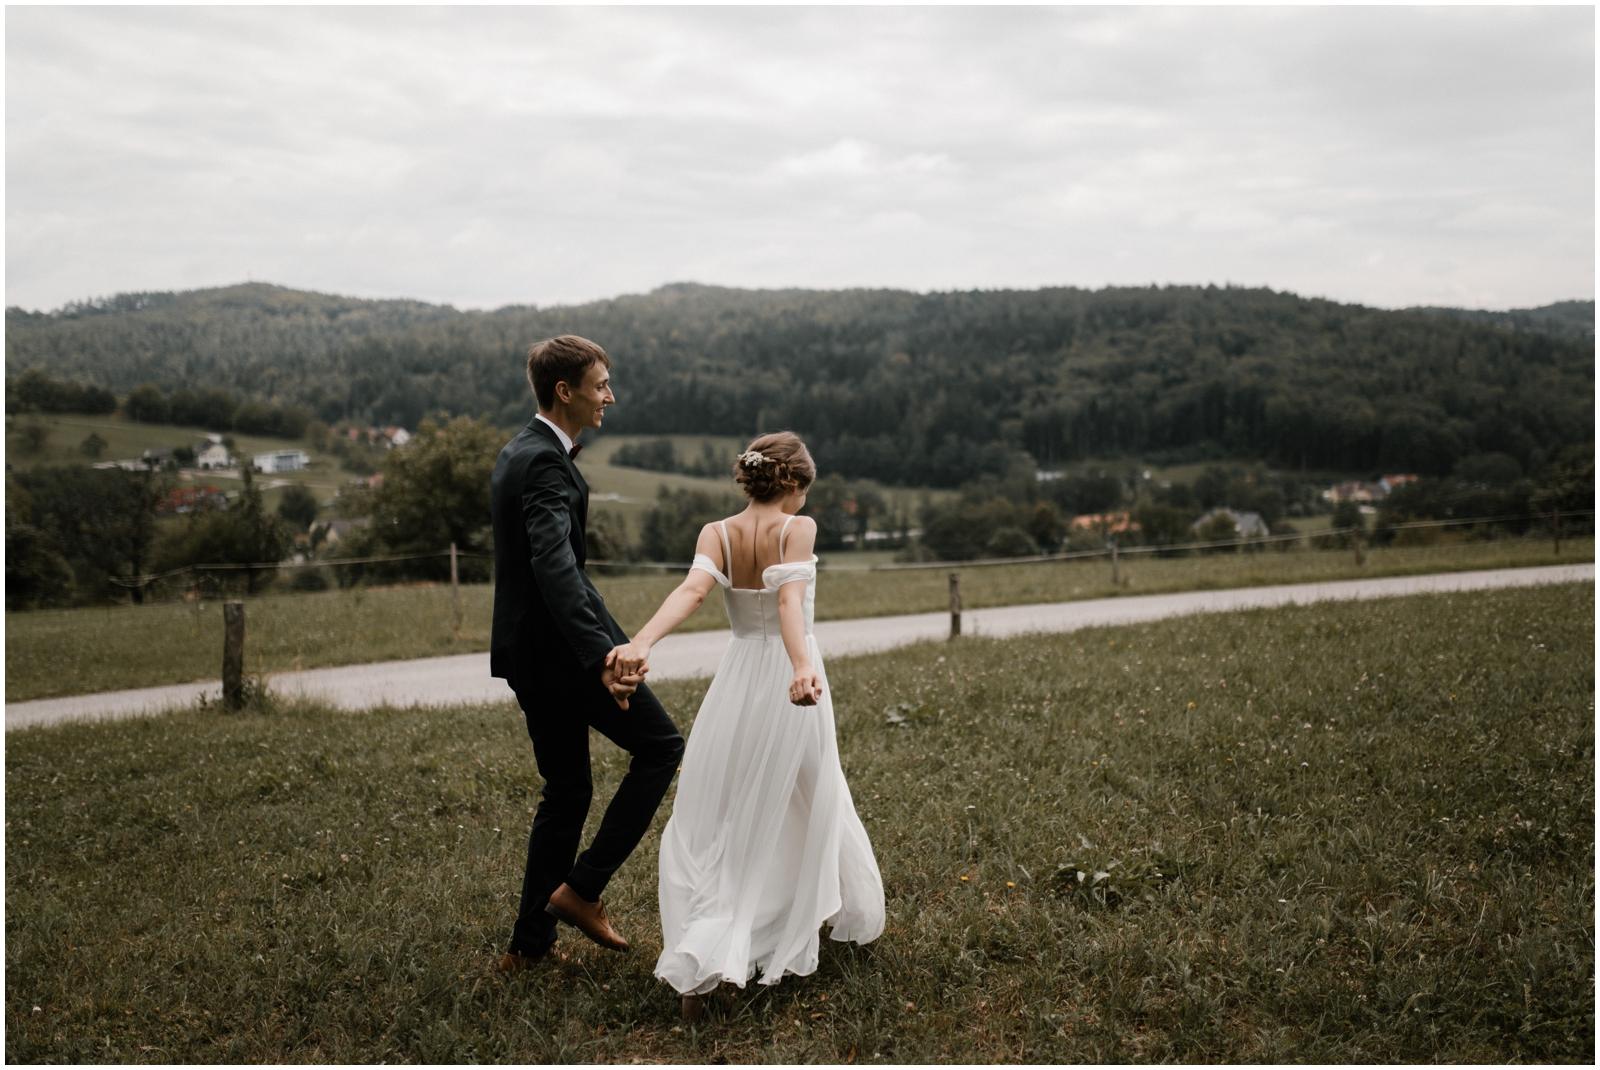 mirjam_thomas_wedding-196.jpg